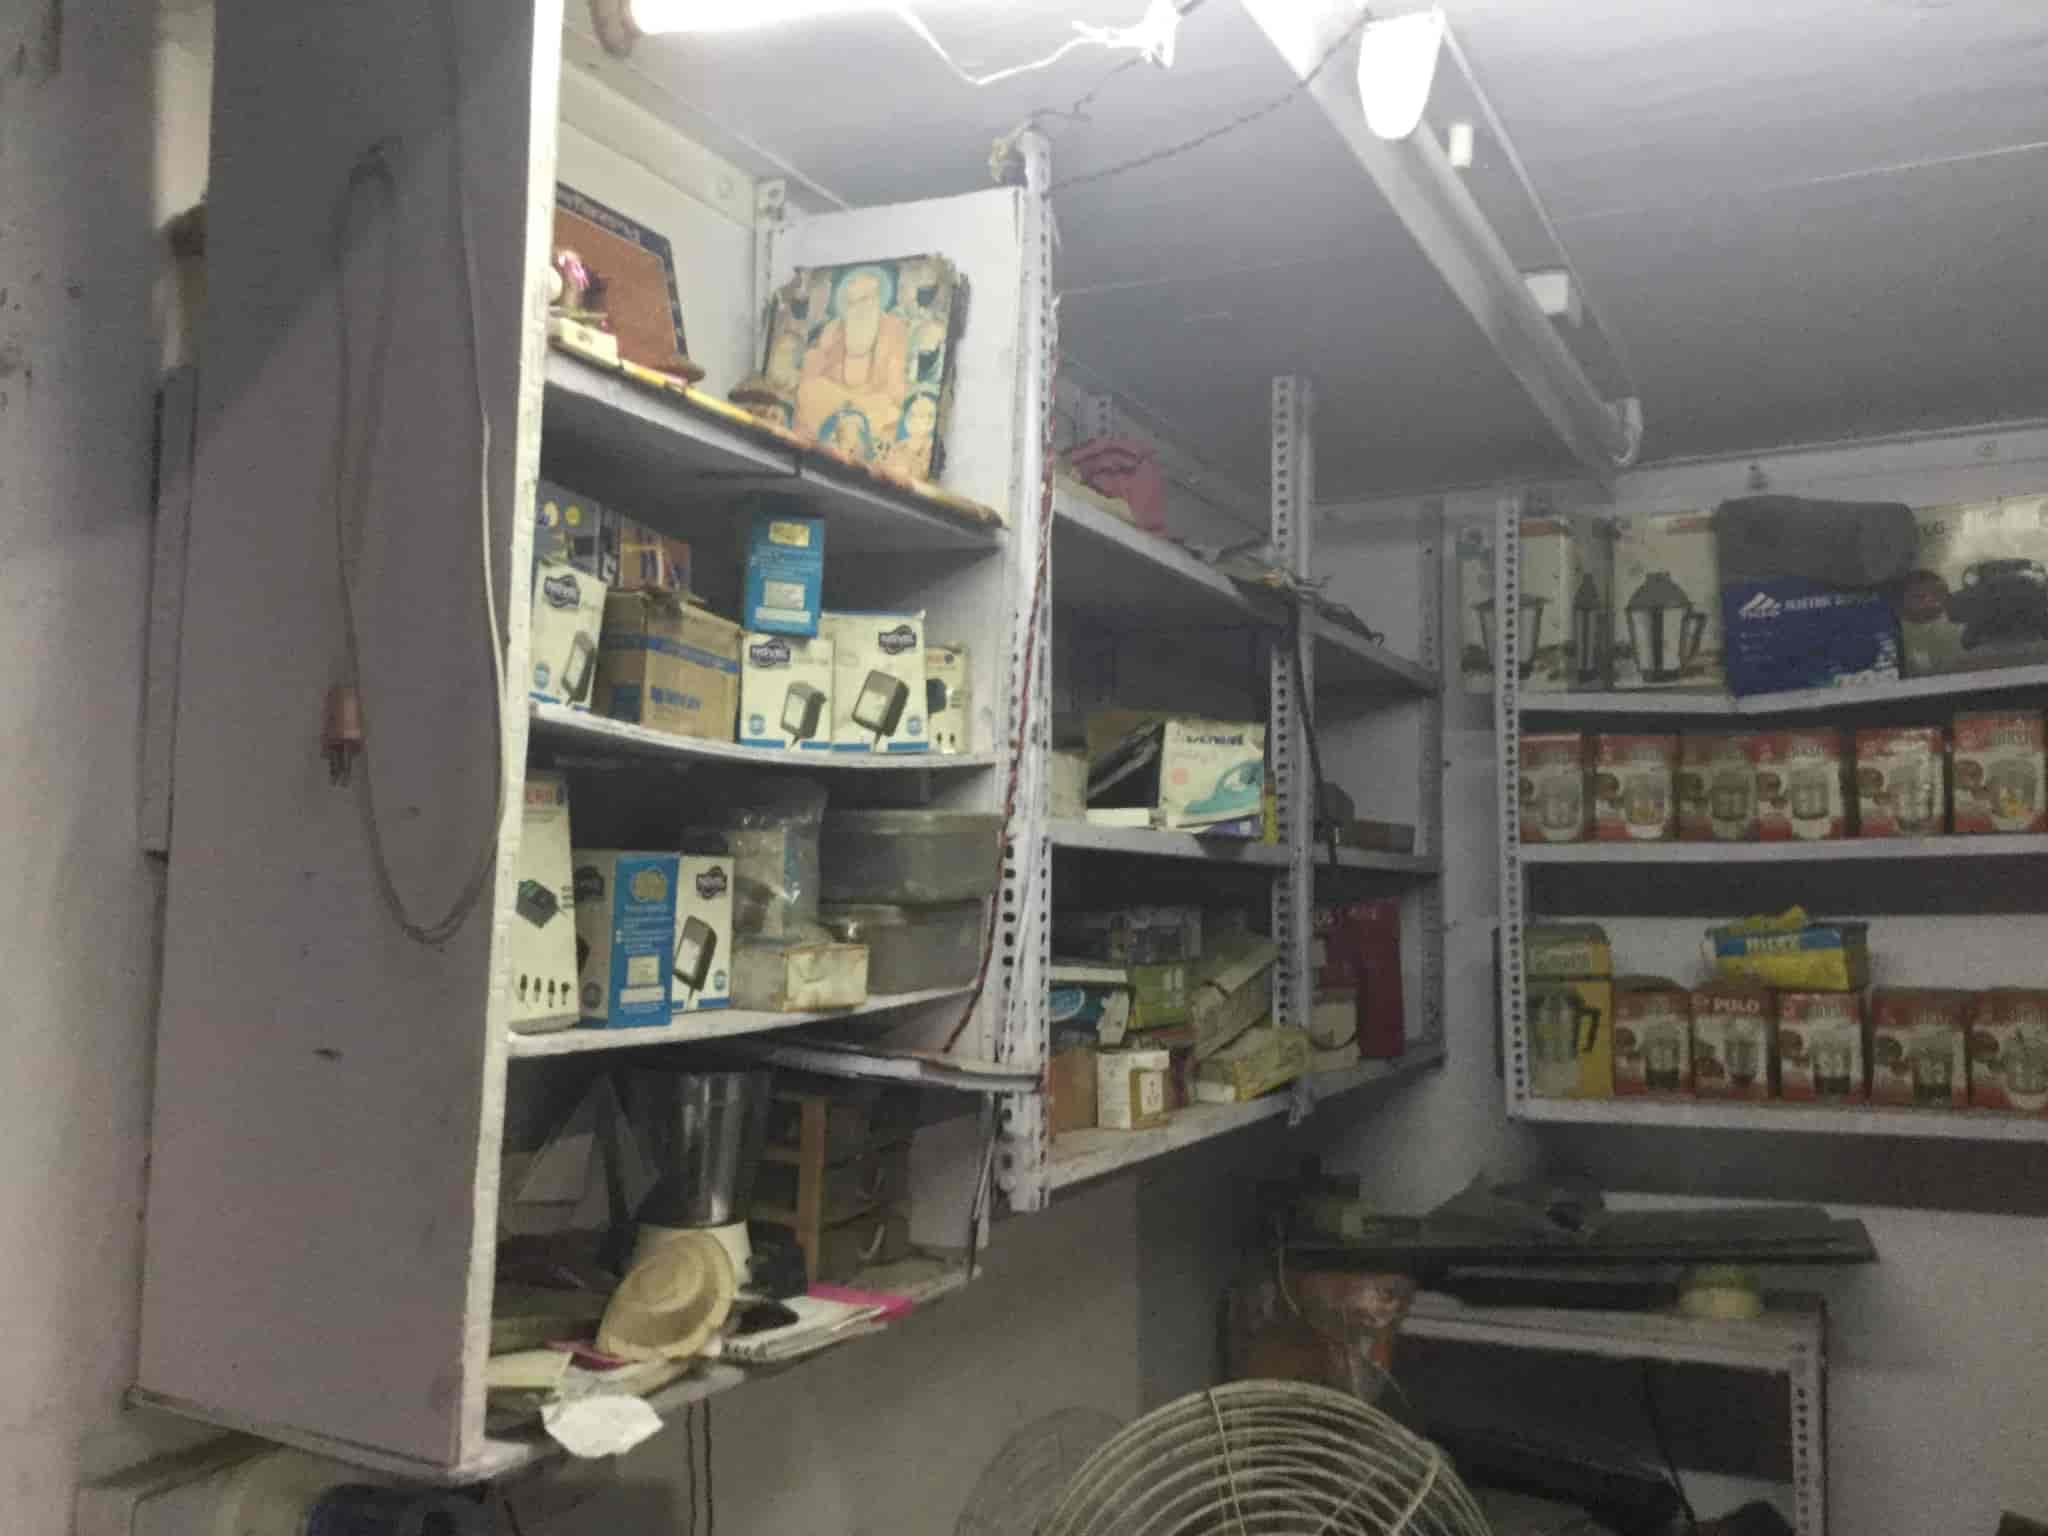 Balaji Refrigeration & Air Condition, Dwarka Sector 10 - AC Repair